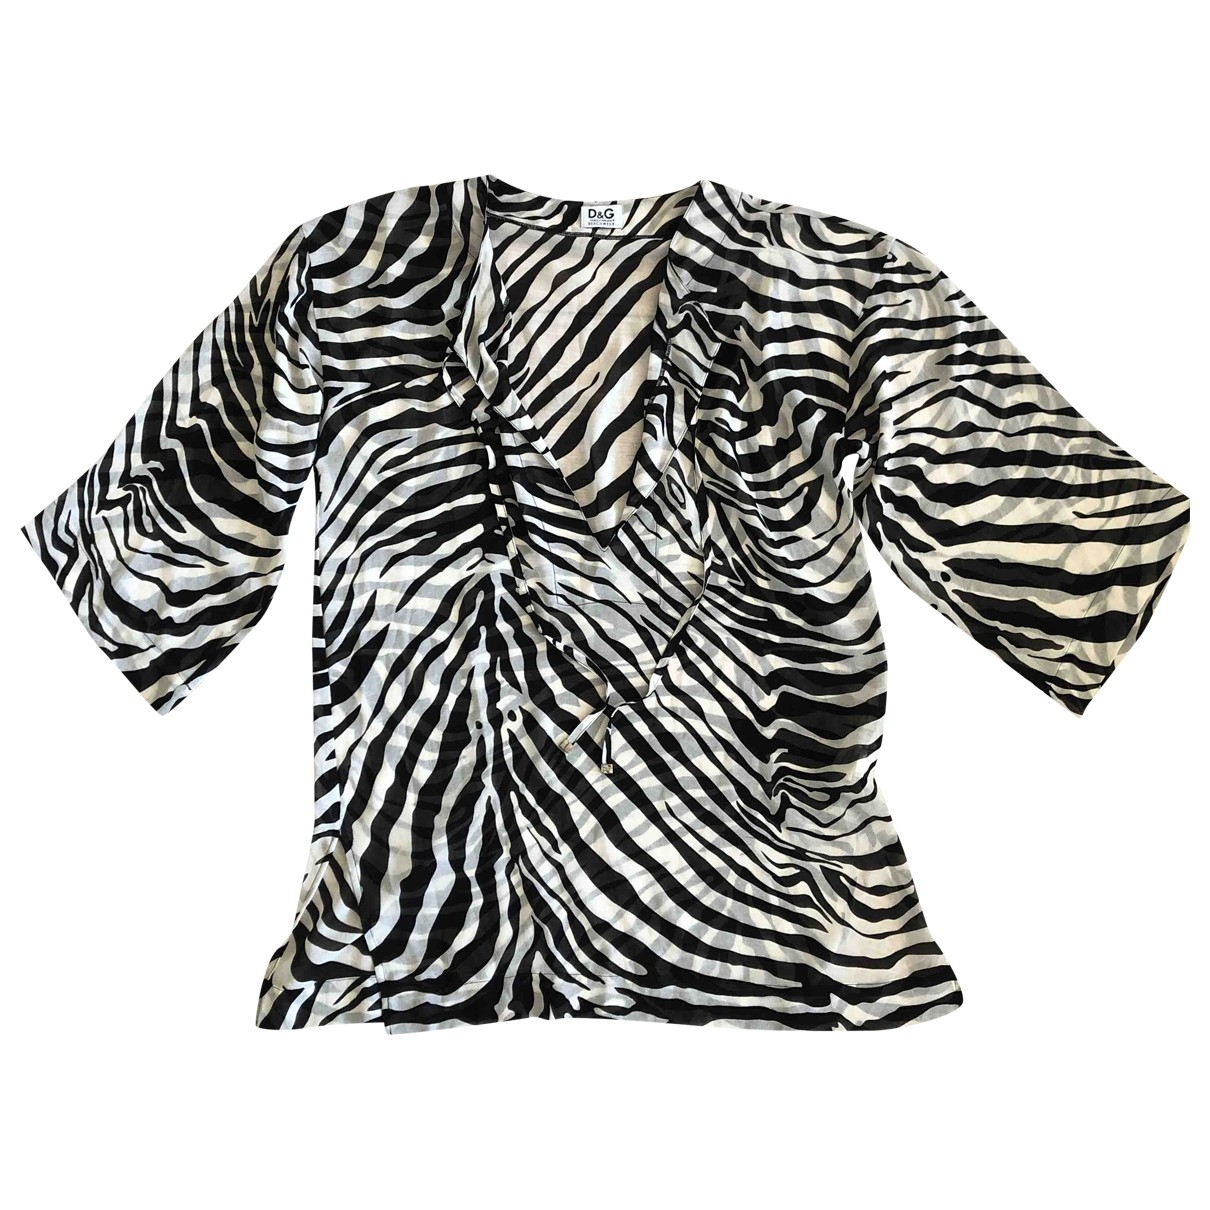 D&g \N Multicolour Swimwear for Women \N